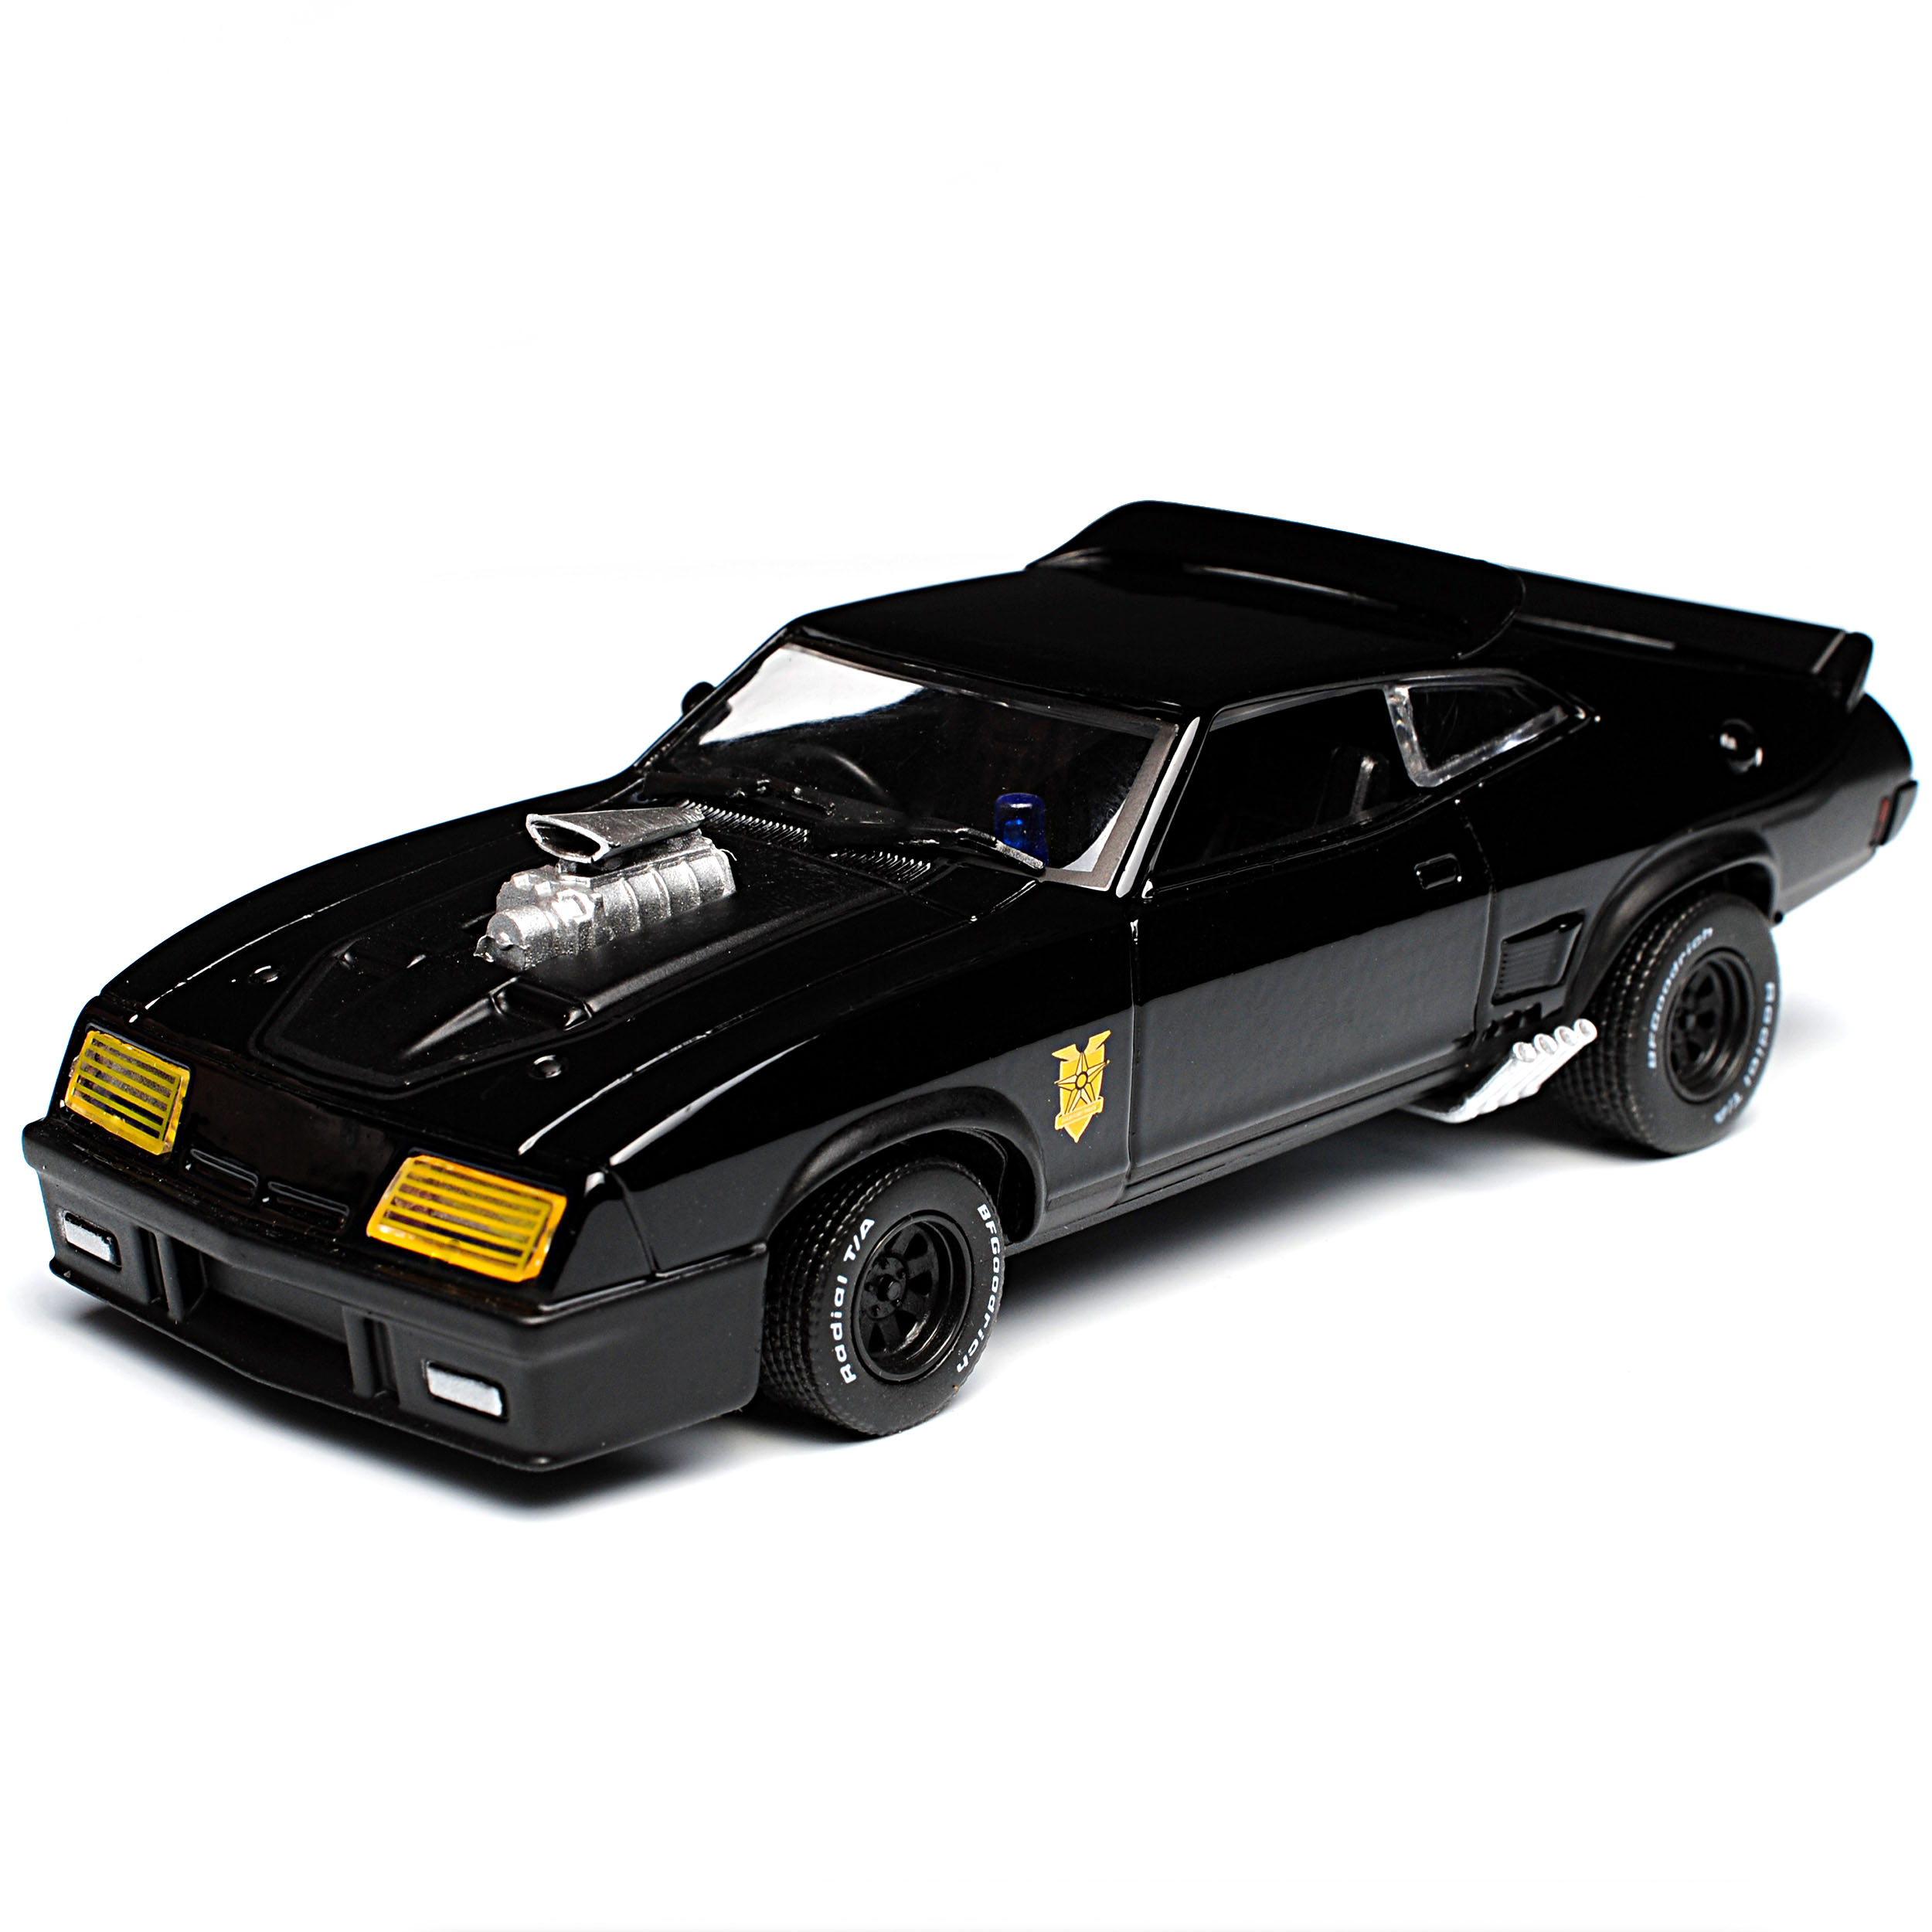 Ford-xb-Falcon-tuned-version-Mad-Max-II-2-Black-interceptor-negro-1973-1-43 miniatura 8